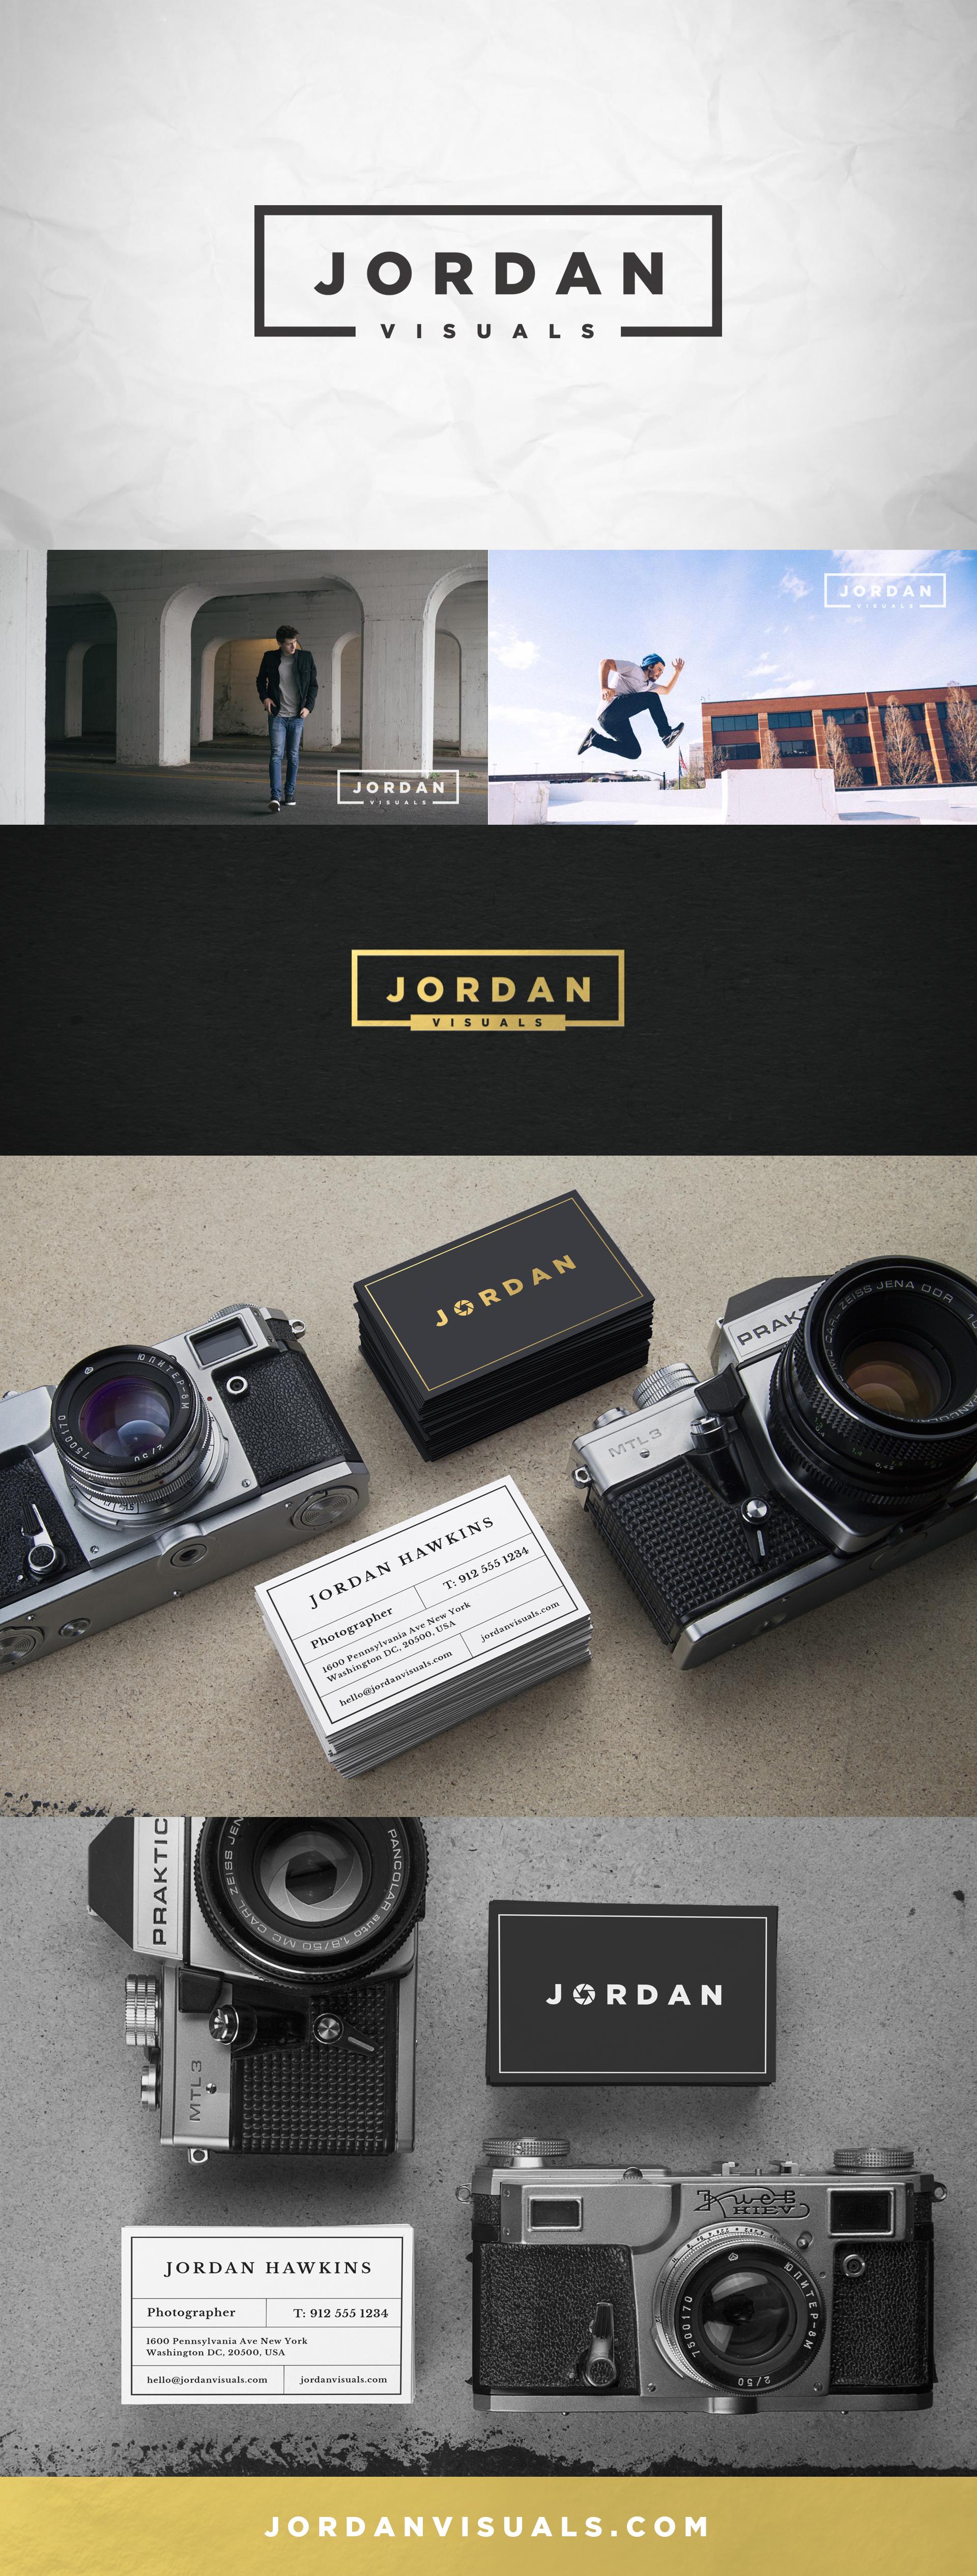 jordan.logo-mockup.presentation.png